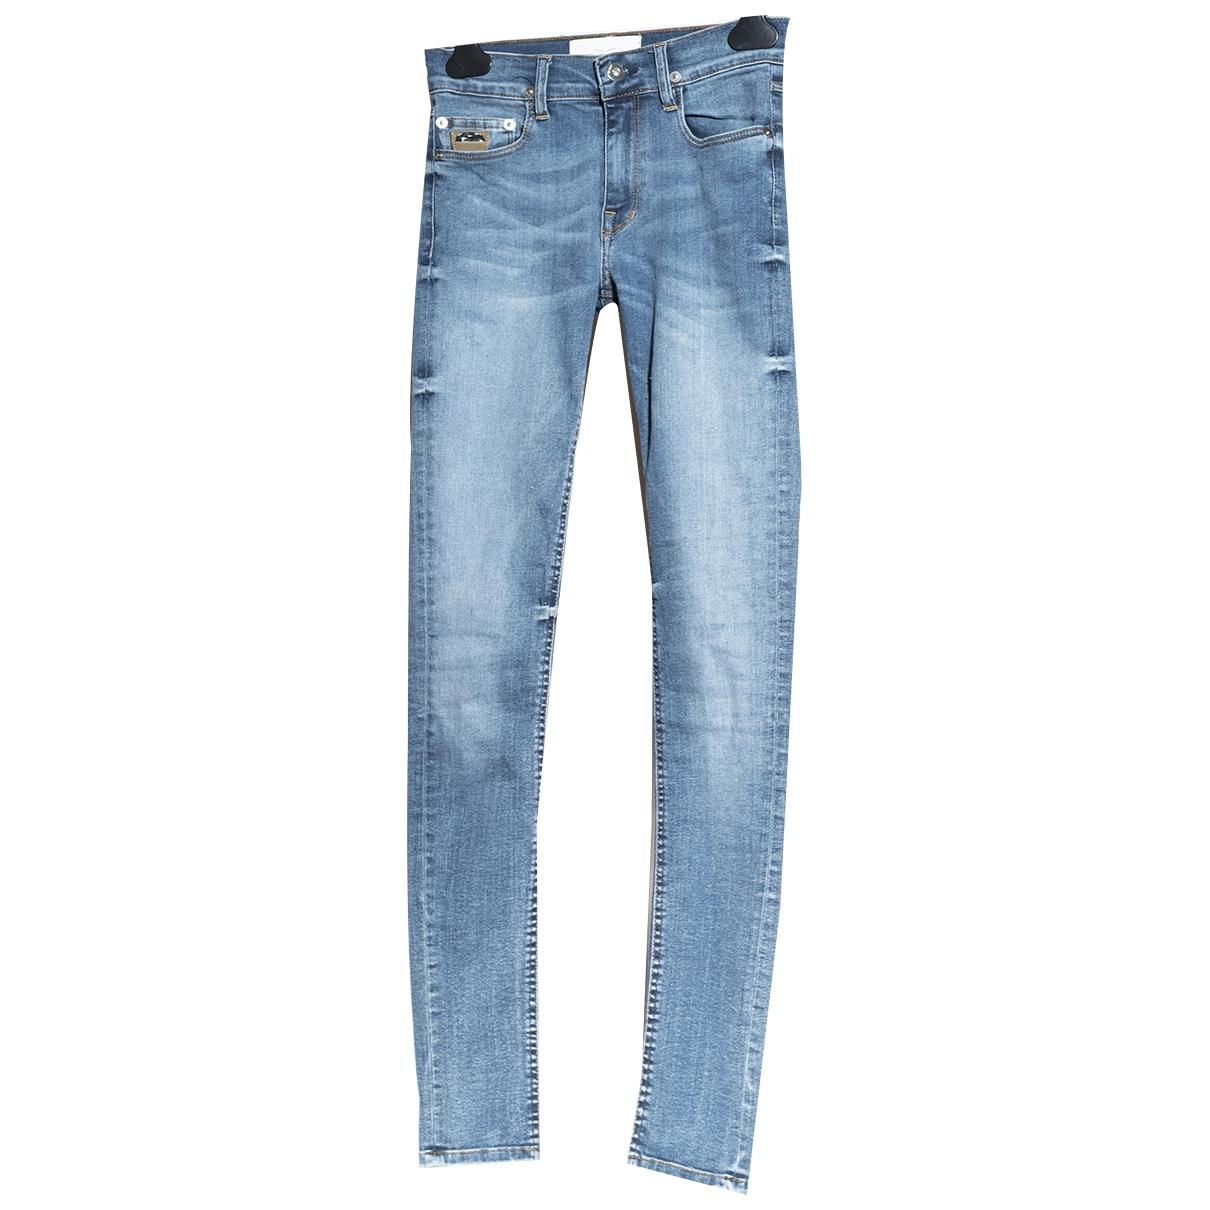 April 77 \N Blue Cotton - elasthane Jeans for Women 24 US